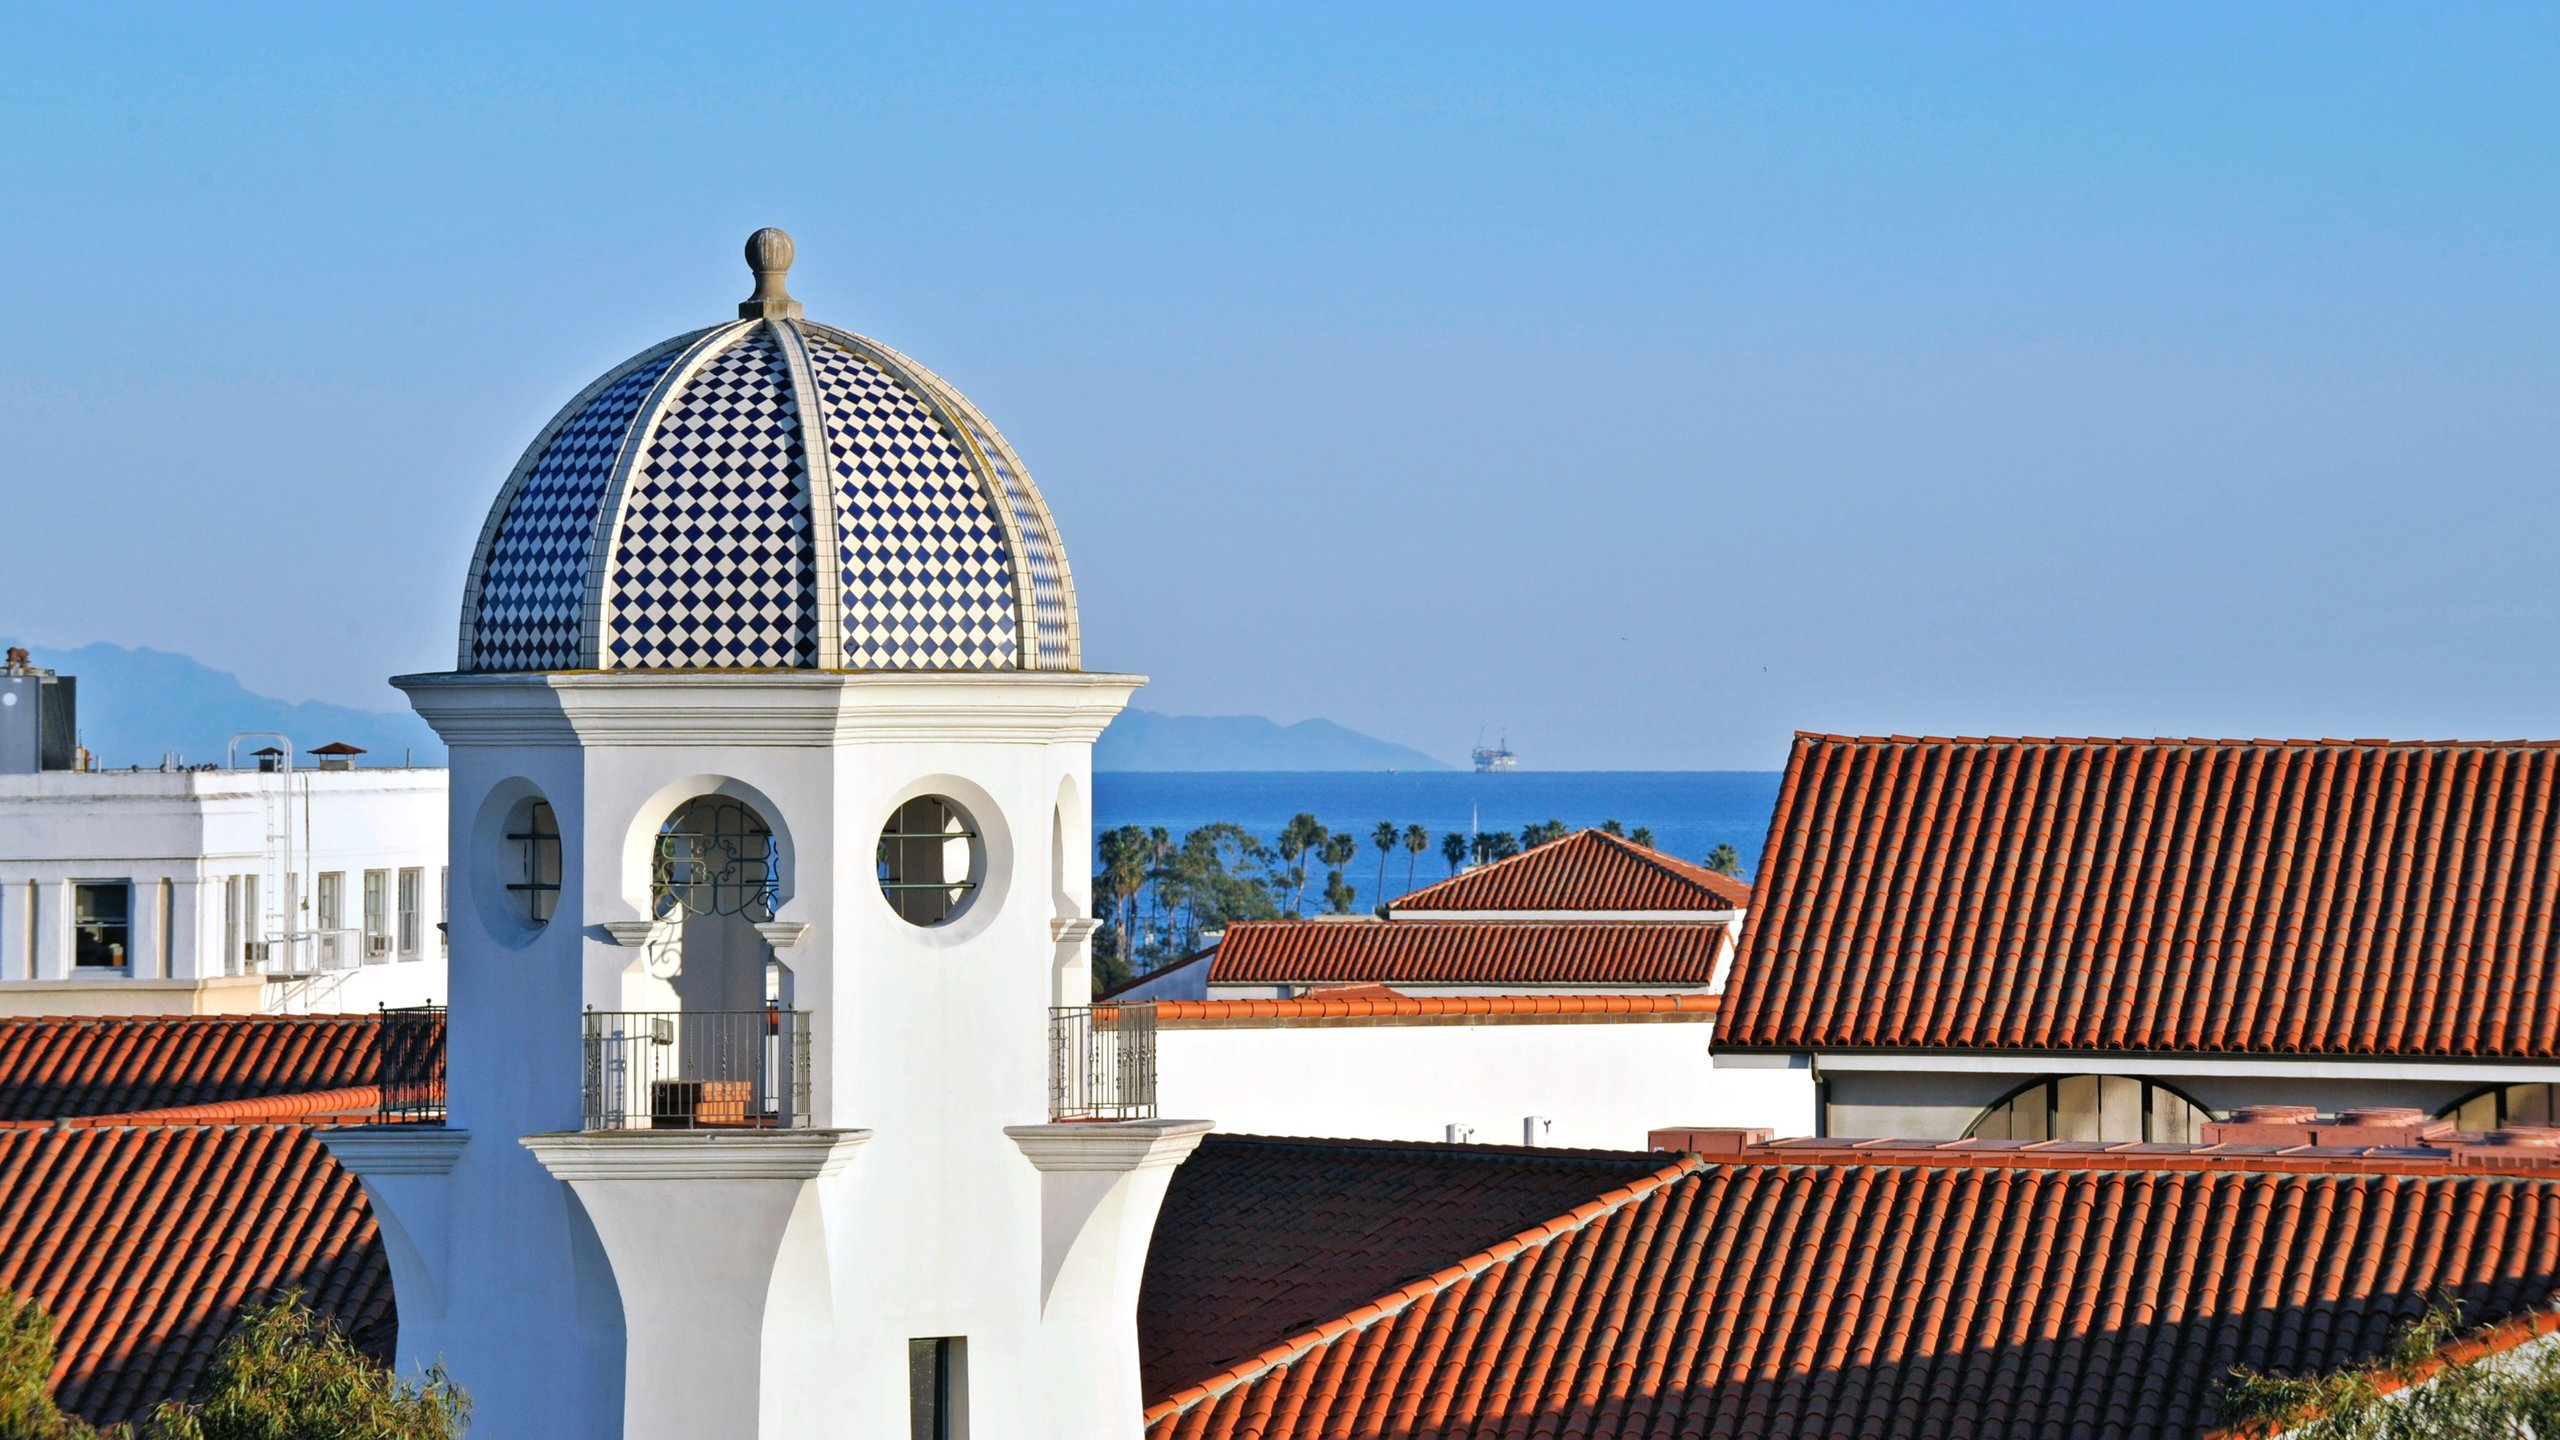 Historic Downtown Santa Barbara, Santa Barbara, California, United States of America